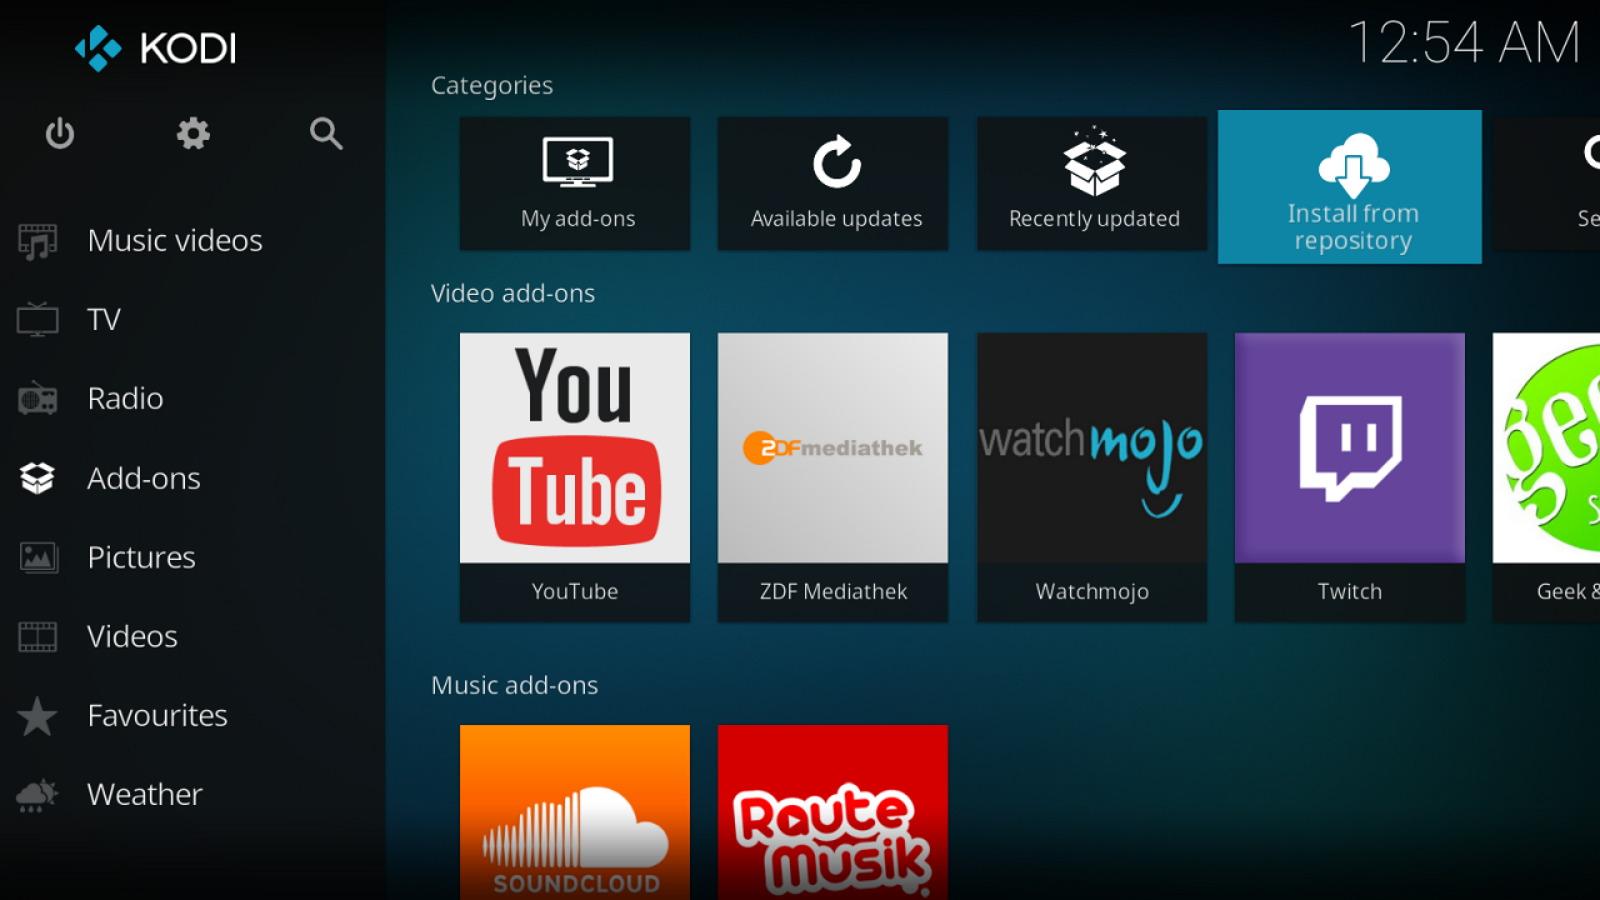 Kodi interface on Xbox One